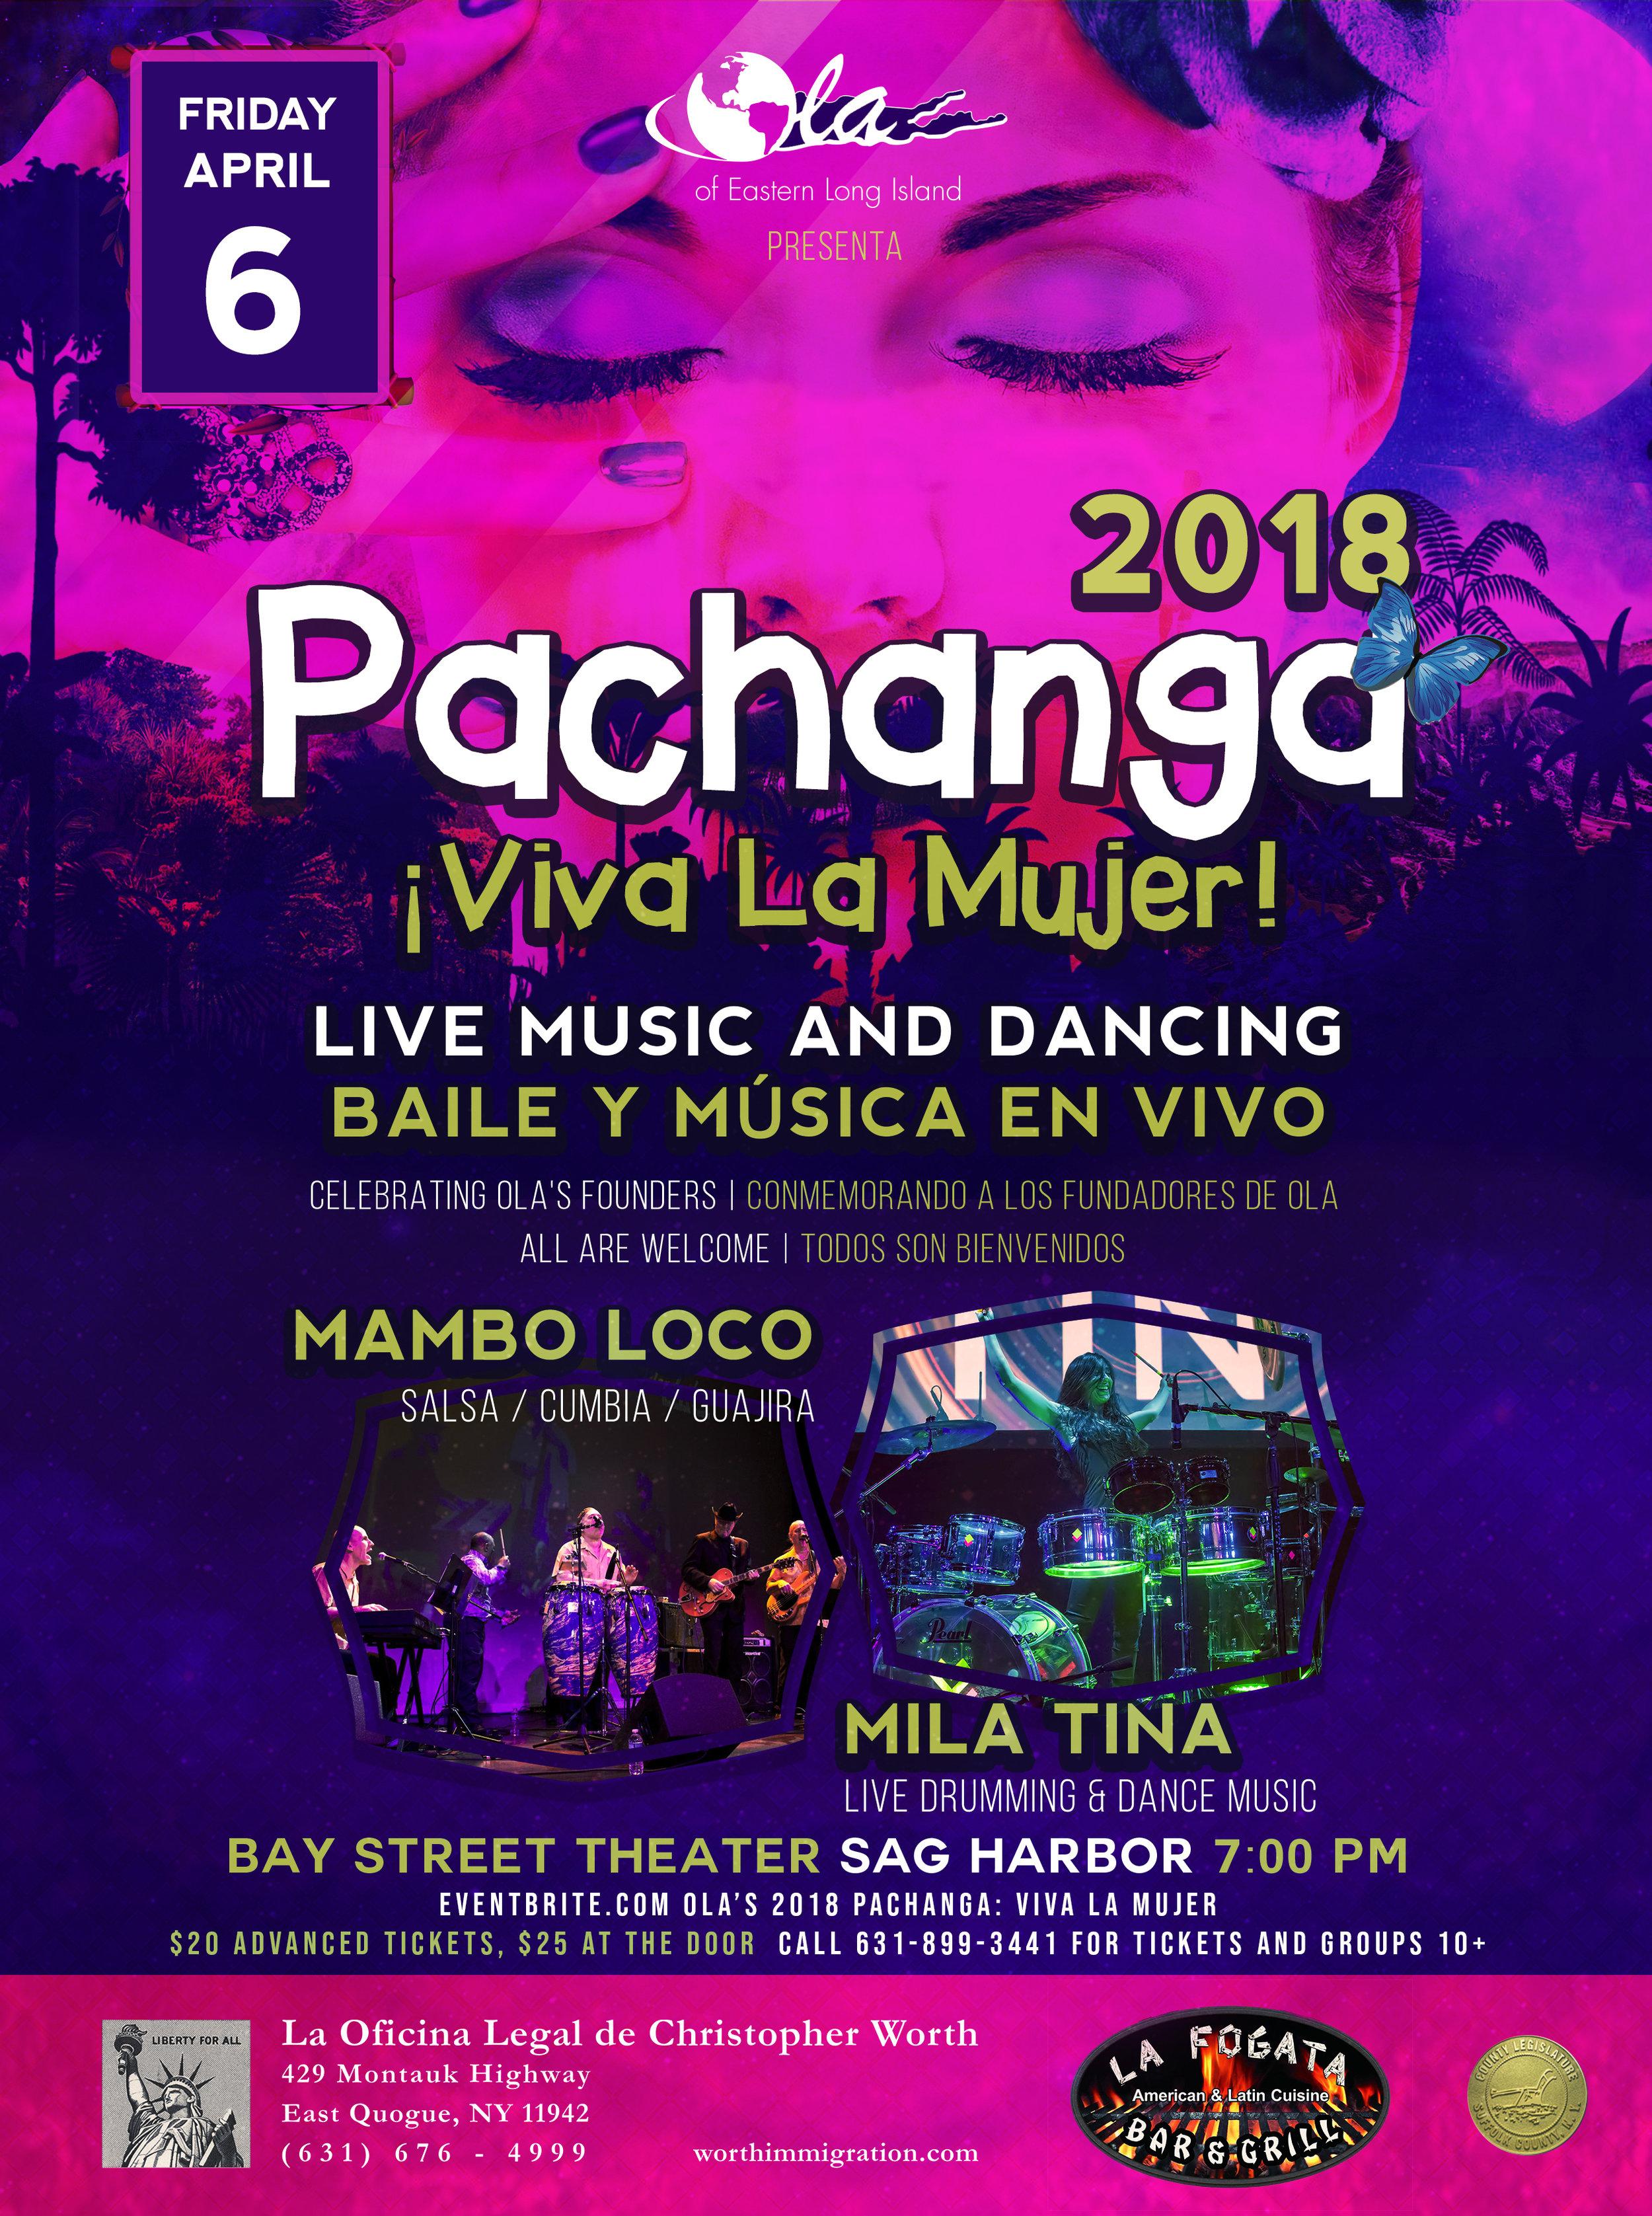 OLA-pachanga-2018-4.jpg